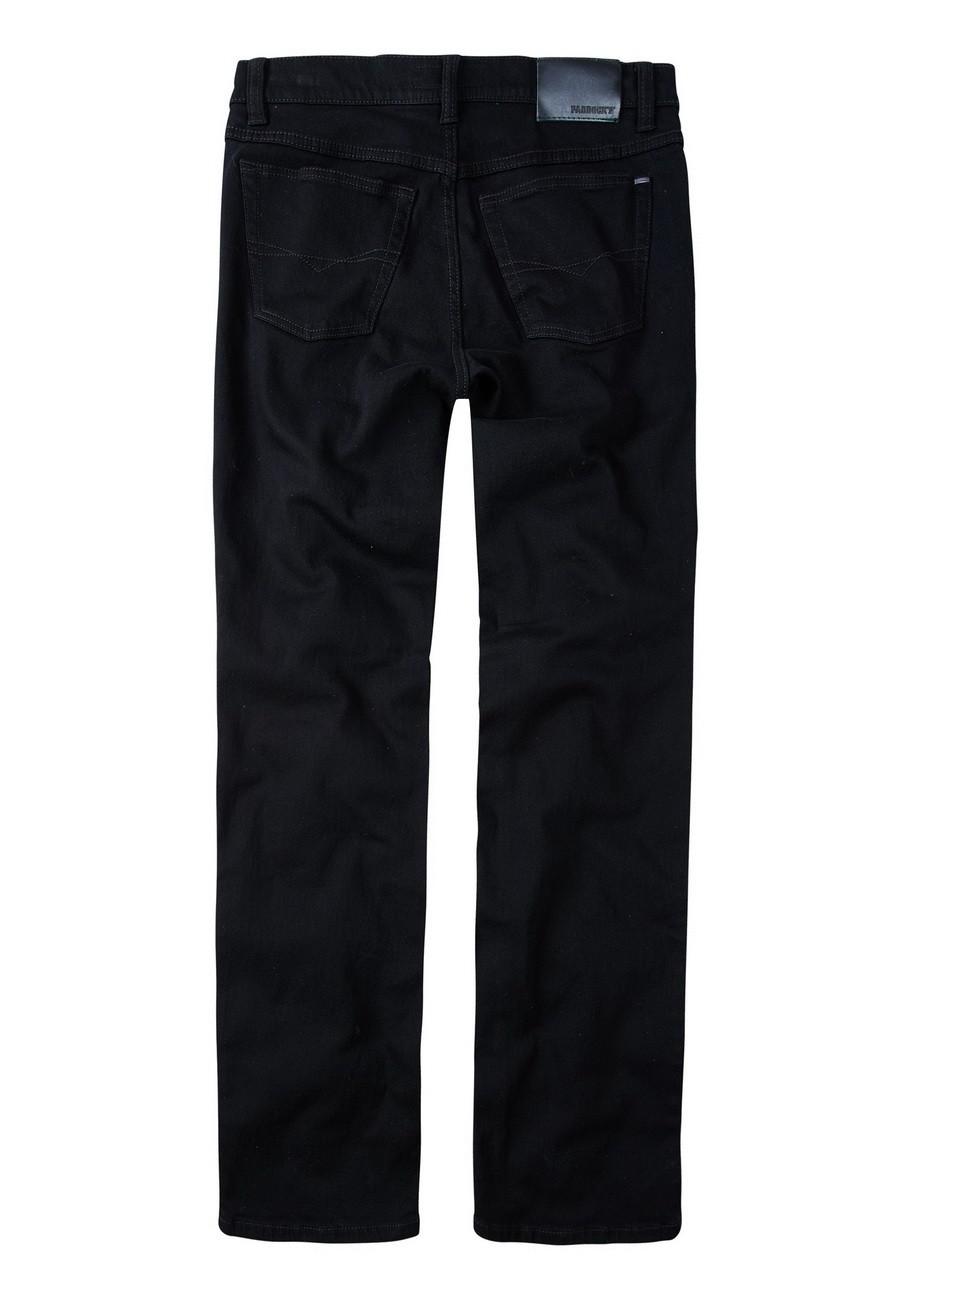 paddock-s-herren-jeans-ranger-slim-fit-schwarz-black-black